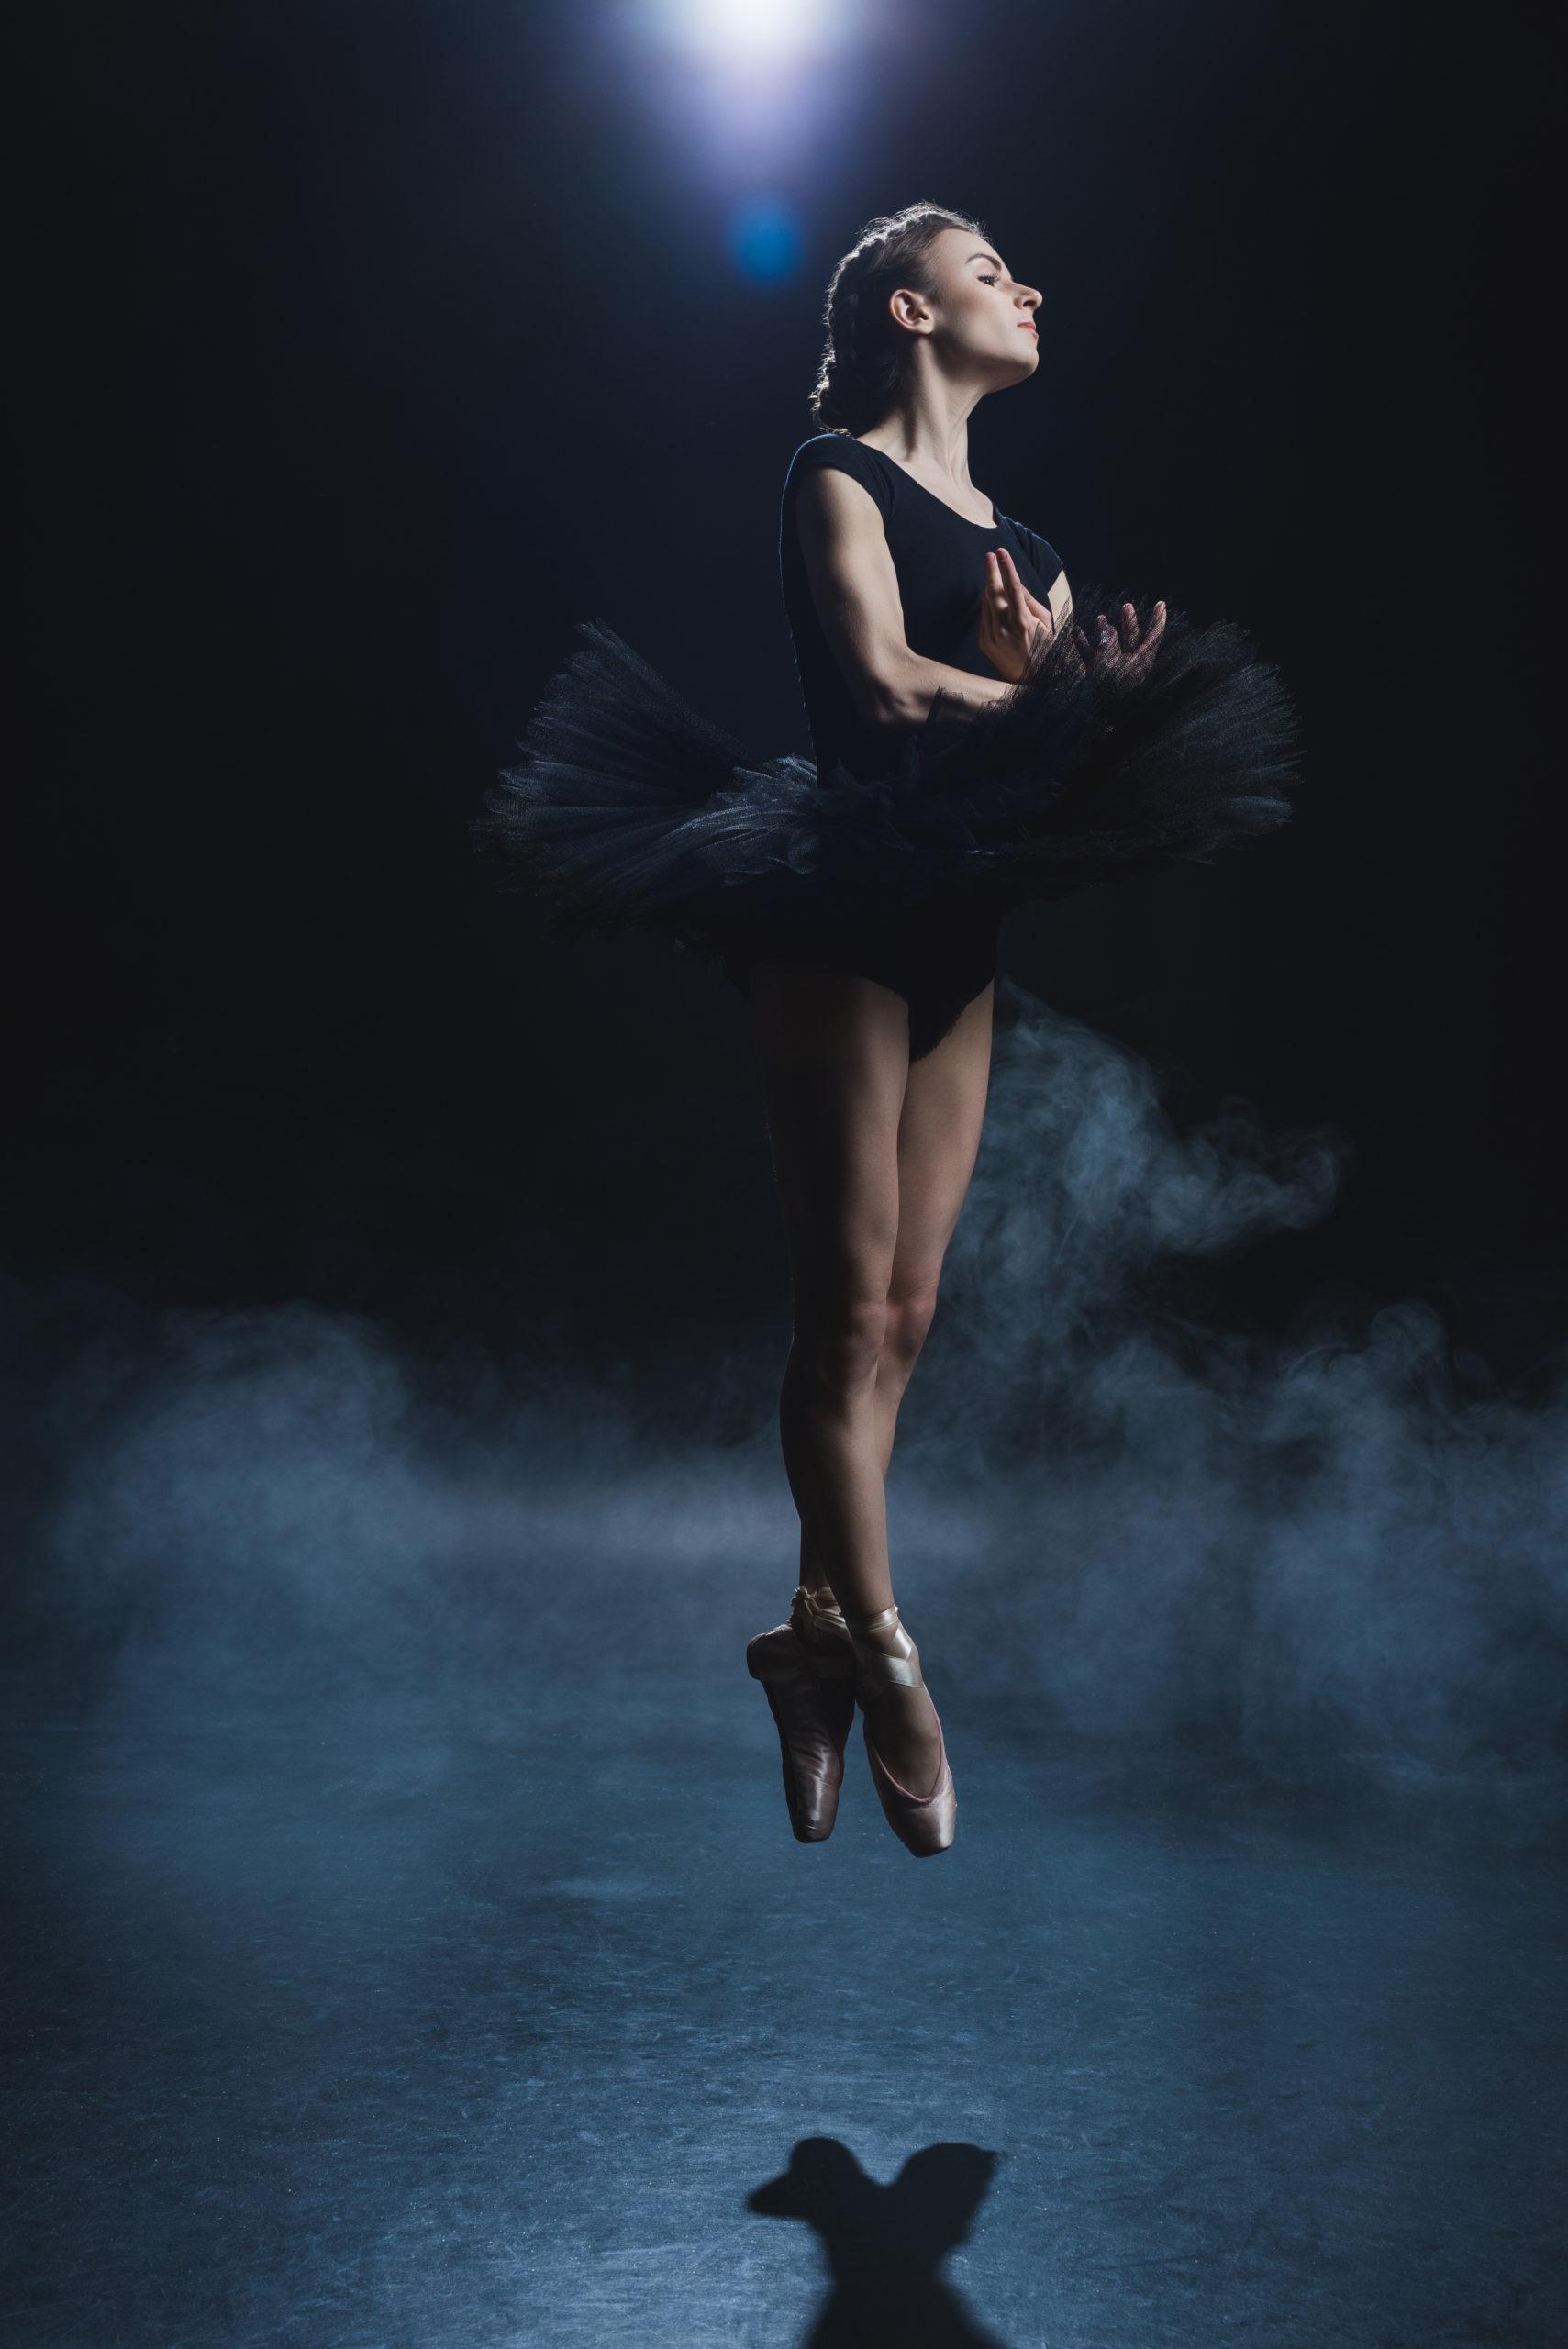 Ballerina dancing in pointe shoes